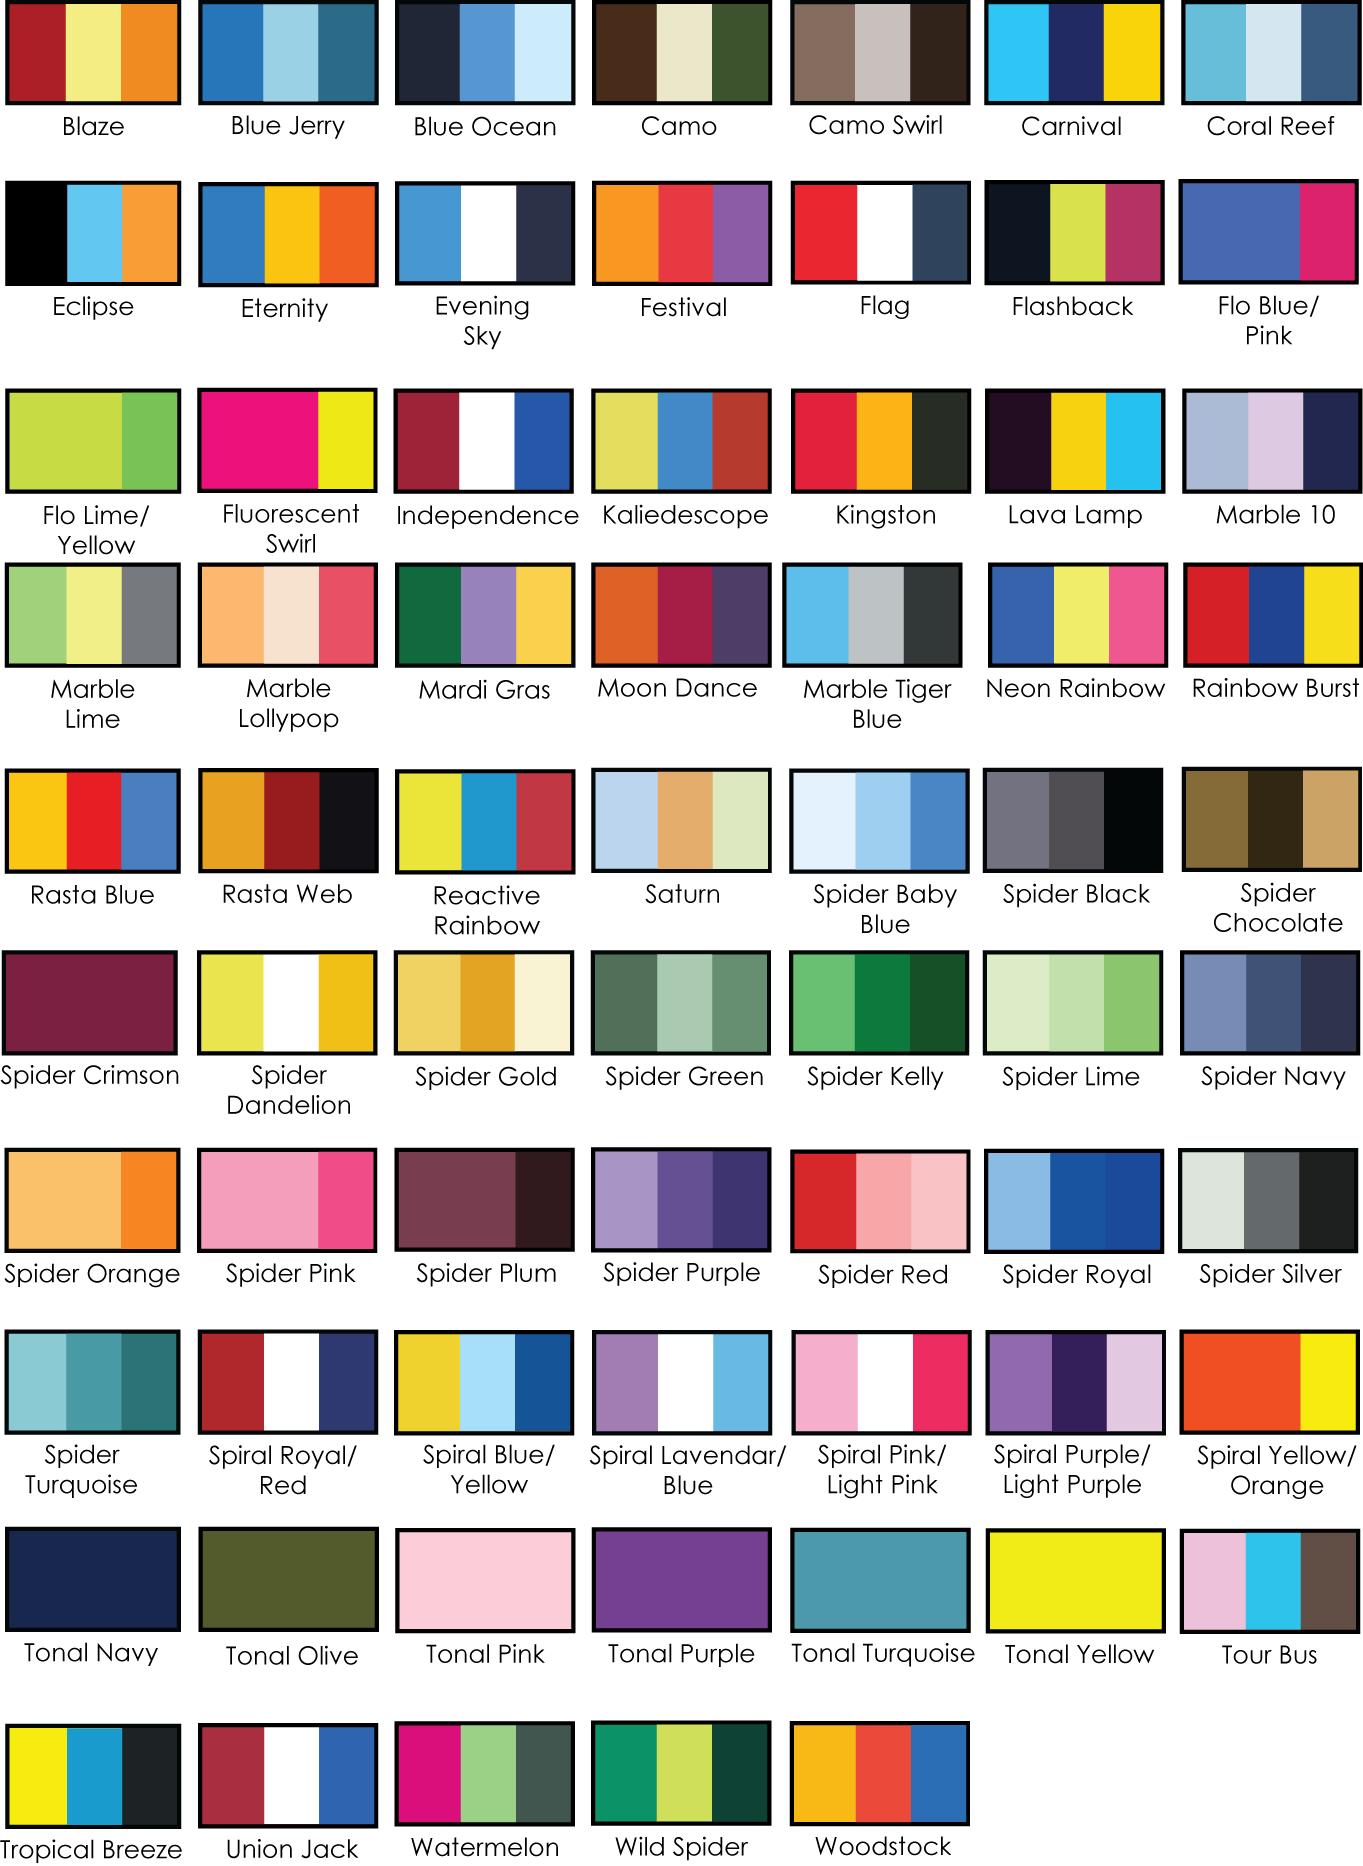 cd100y_image-colors